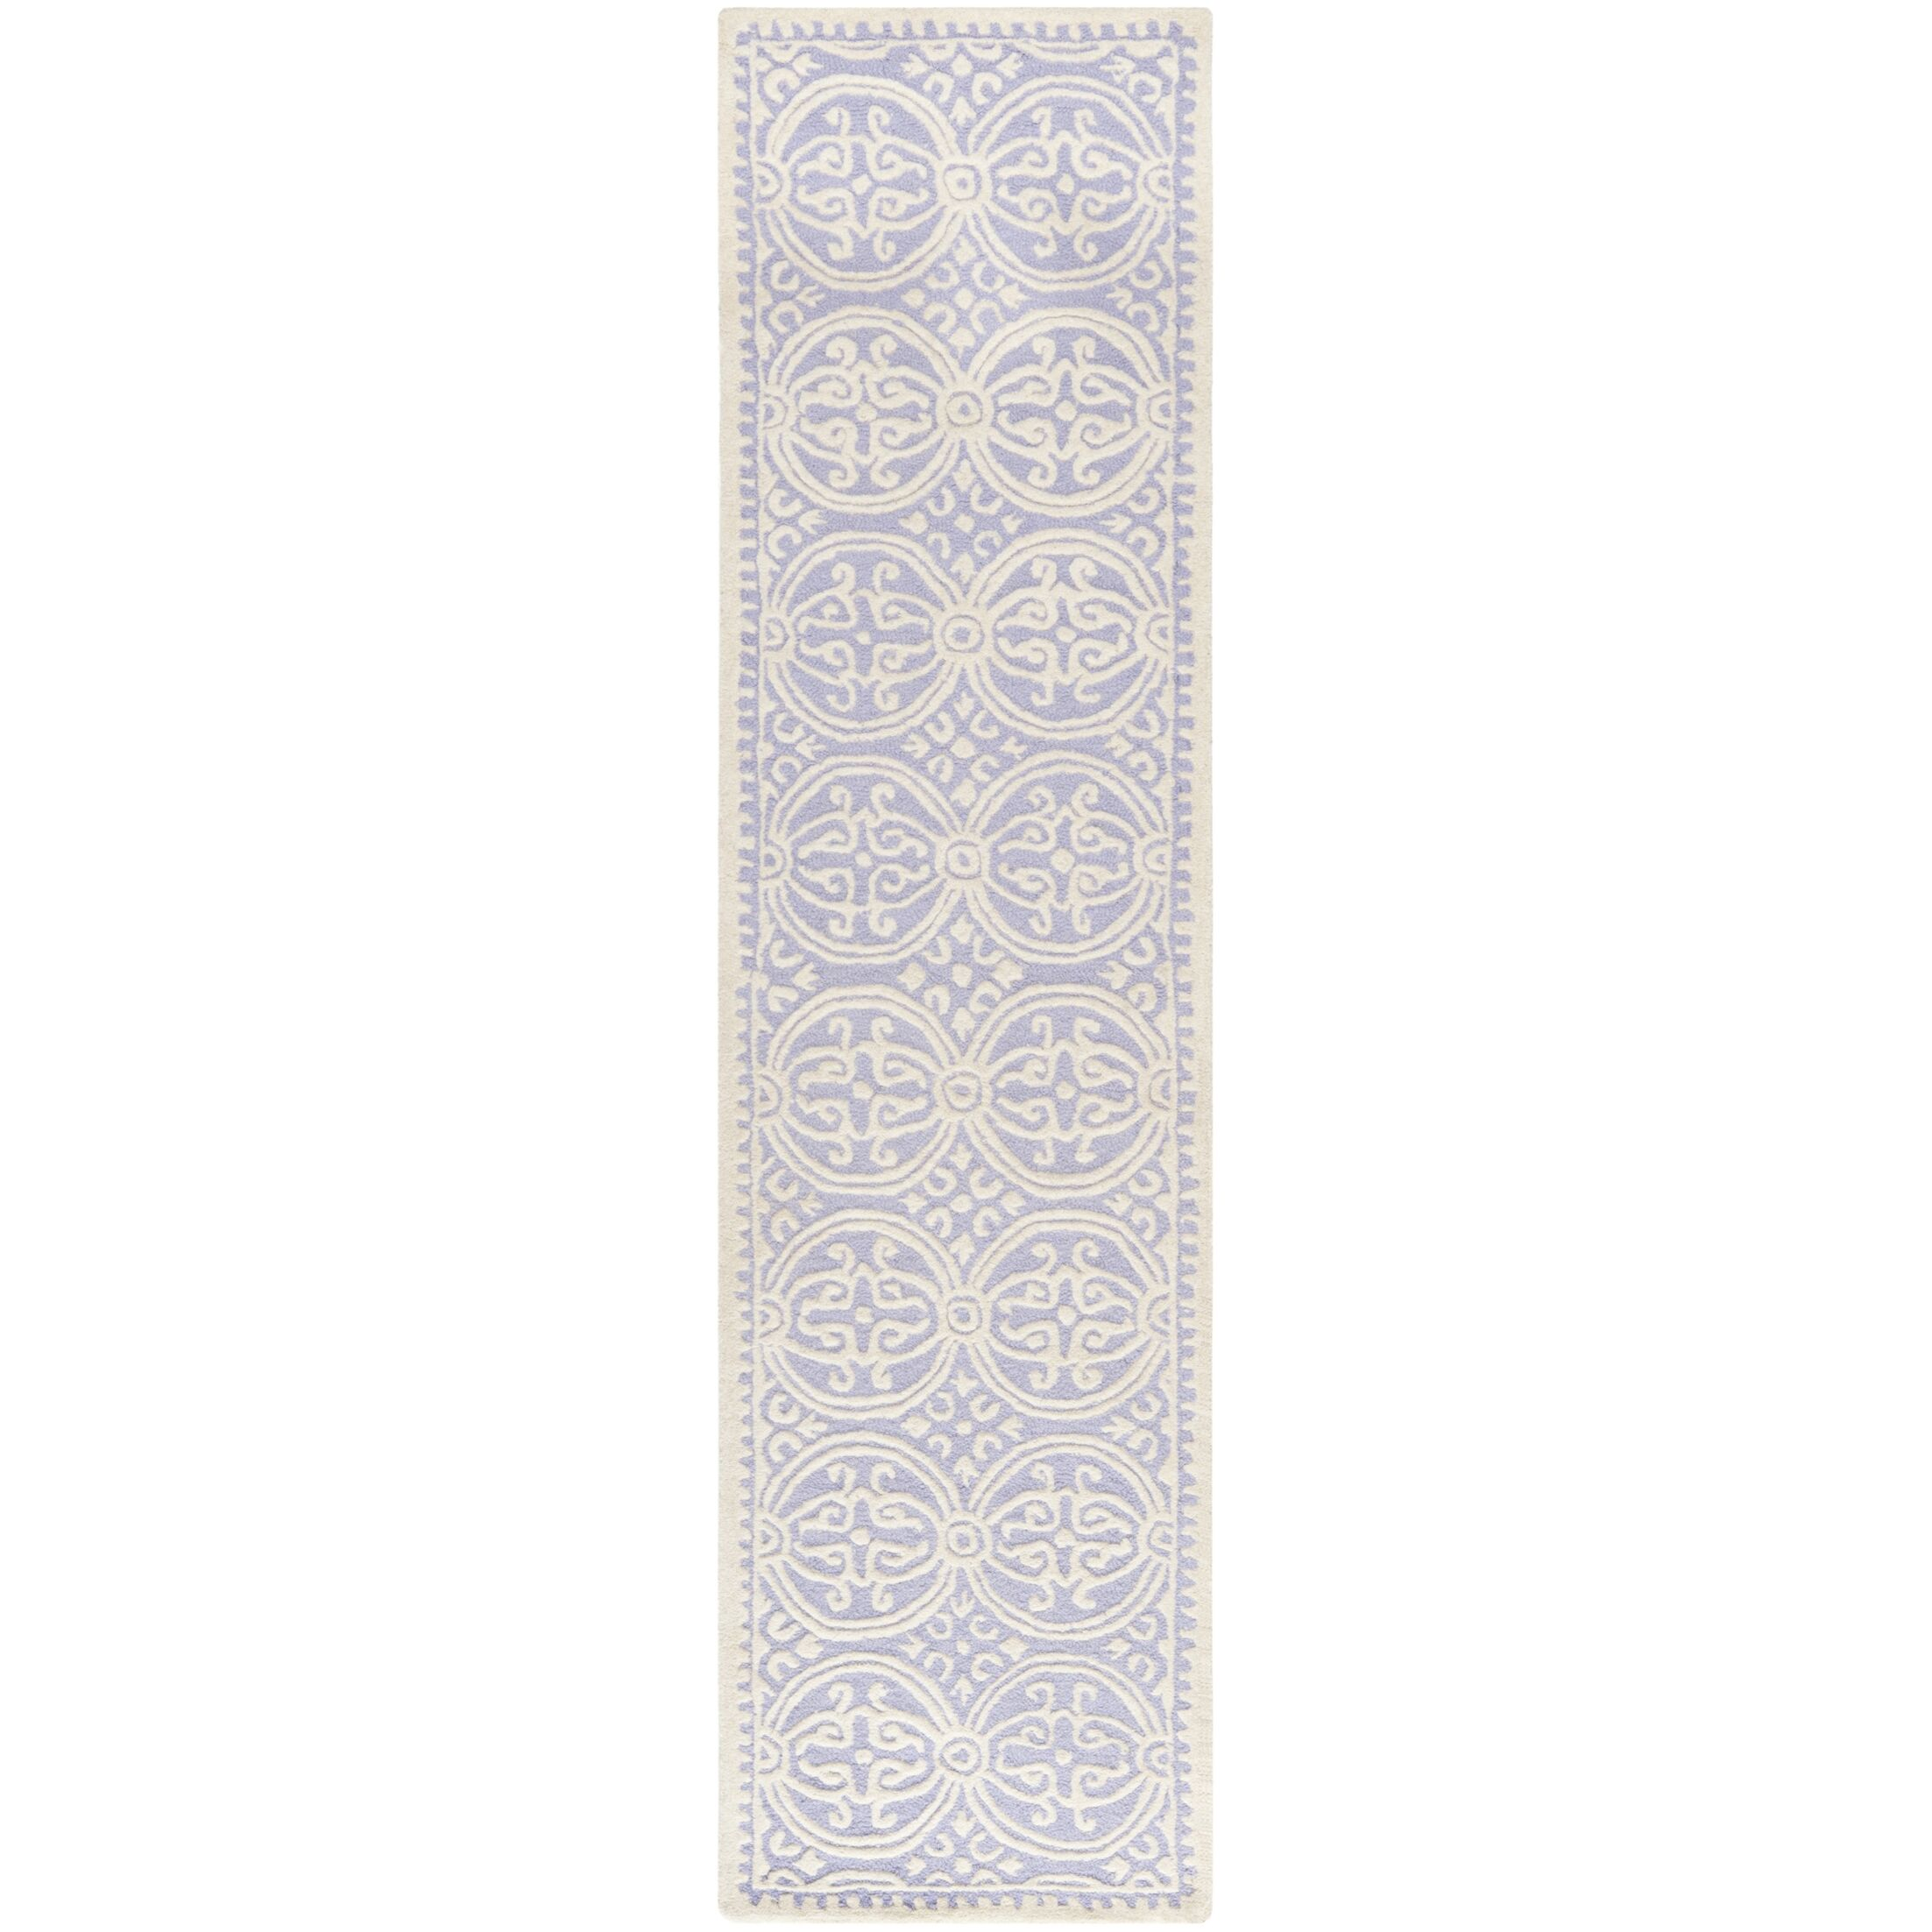 Martins Hand-Tufted Wool Lavender/Ivory Area Rug Rug Size: Runner 2'6